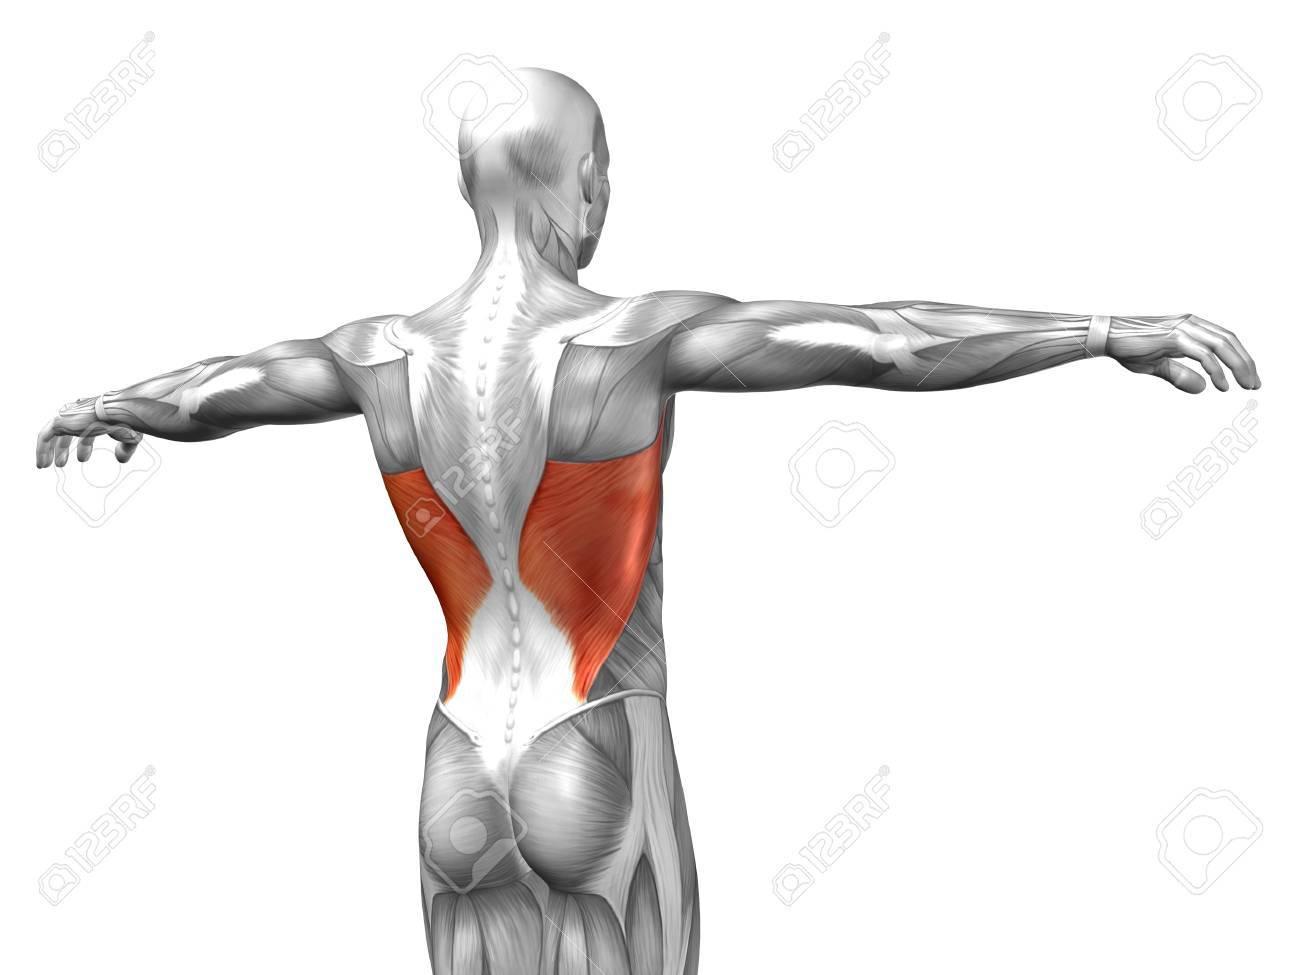 Beste Muskeln Zurück Galerie - Anatomie Ideen - finotti.info